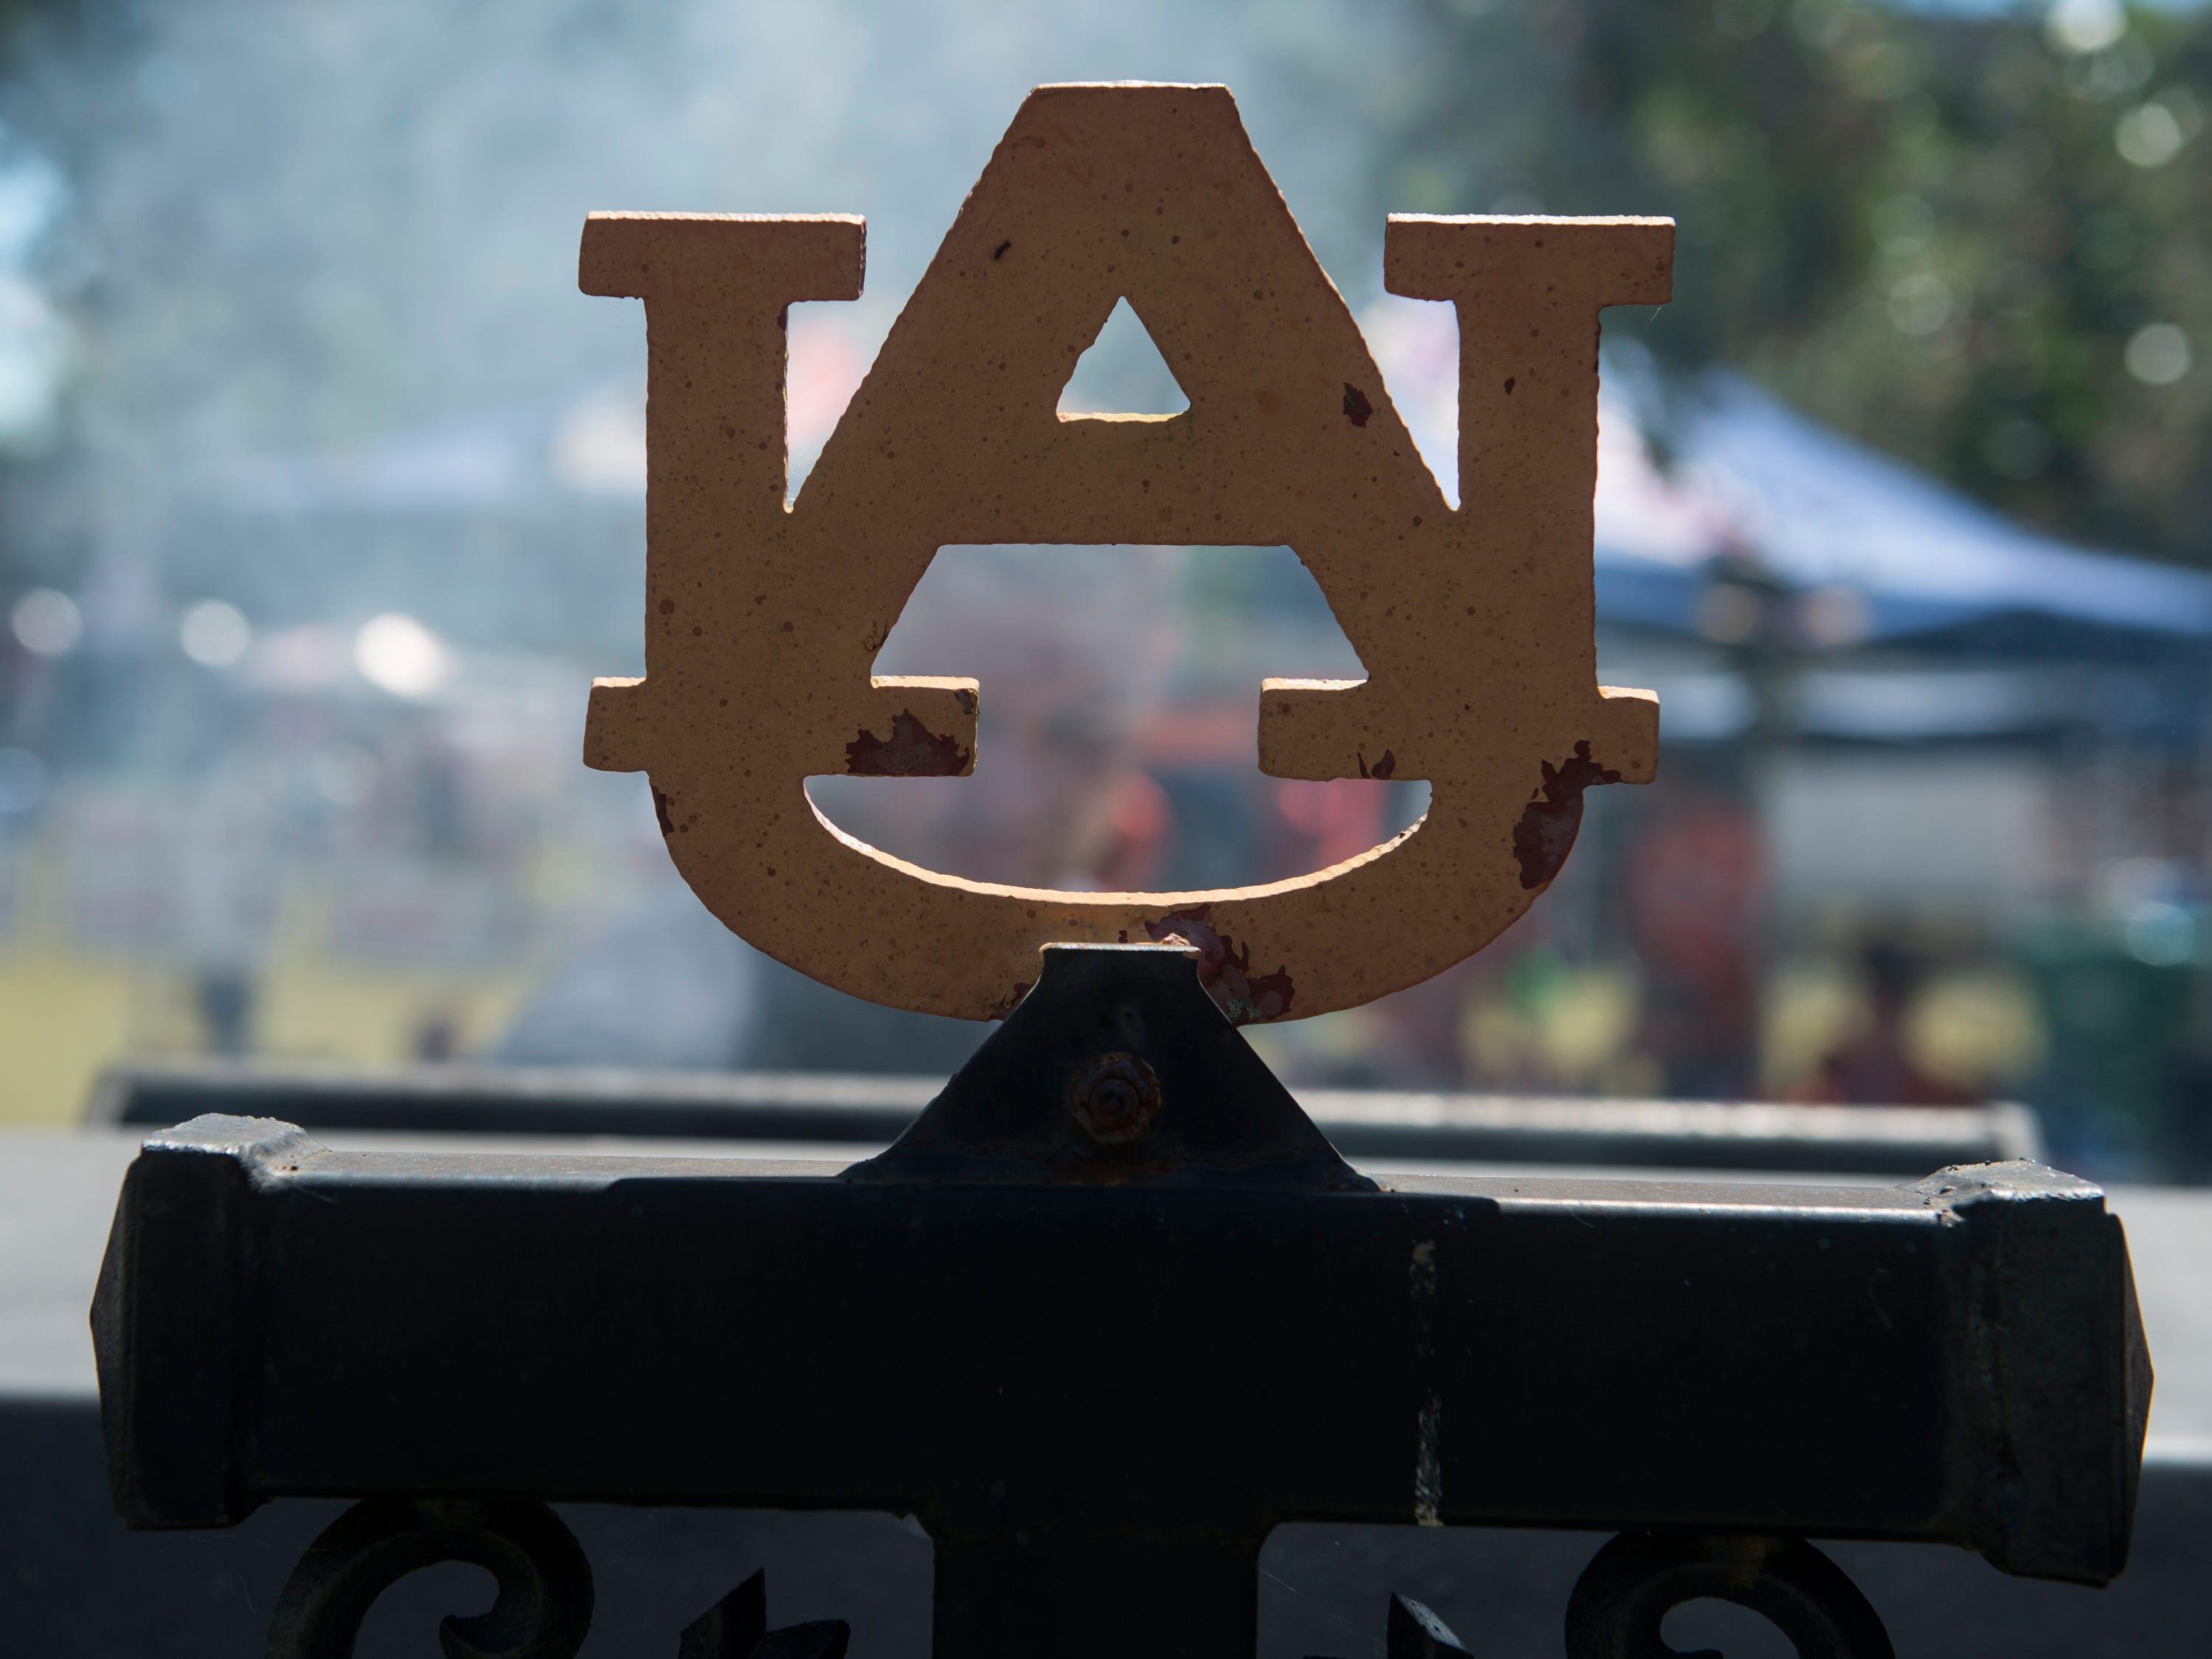 Jacob Vehrs cooks on his custom grill outside Jordan-Hare Stadium in Auburn, Ala., on Saturday, Sept. 15, 2018.